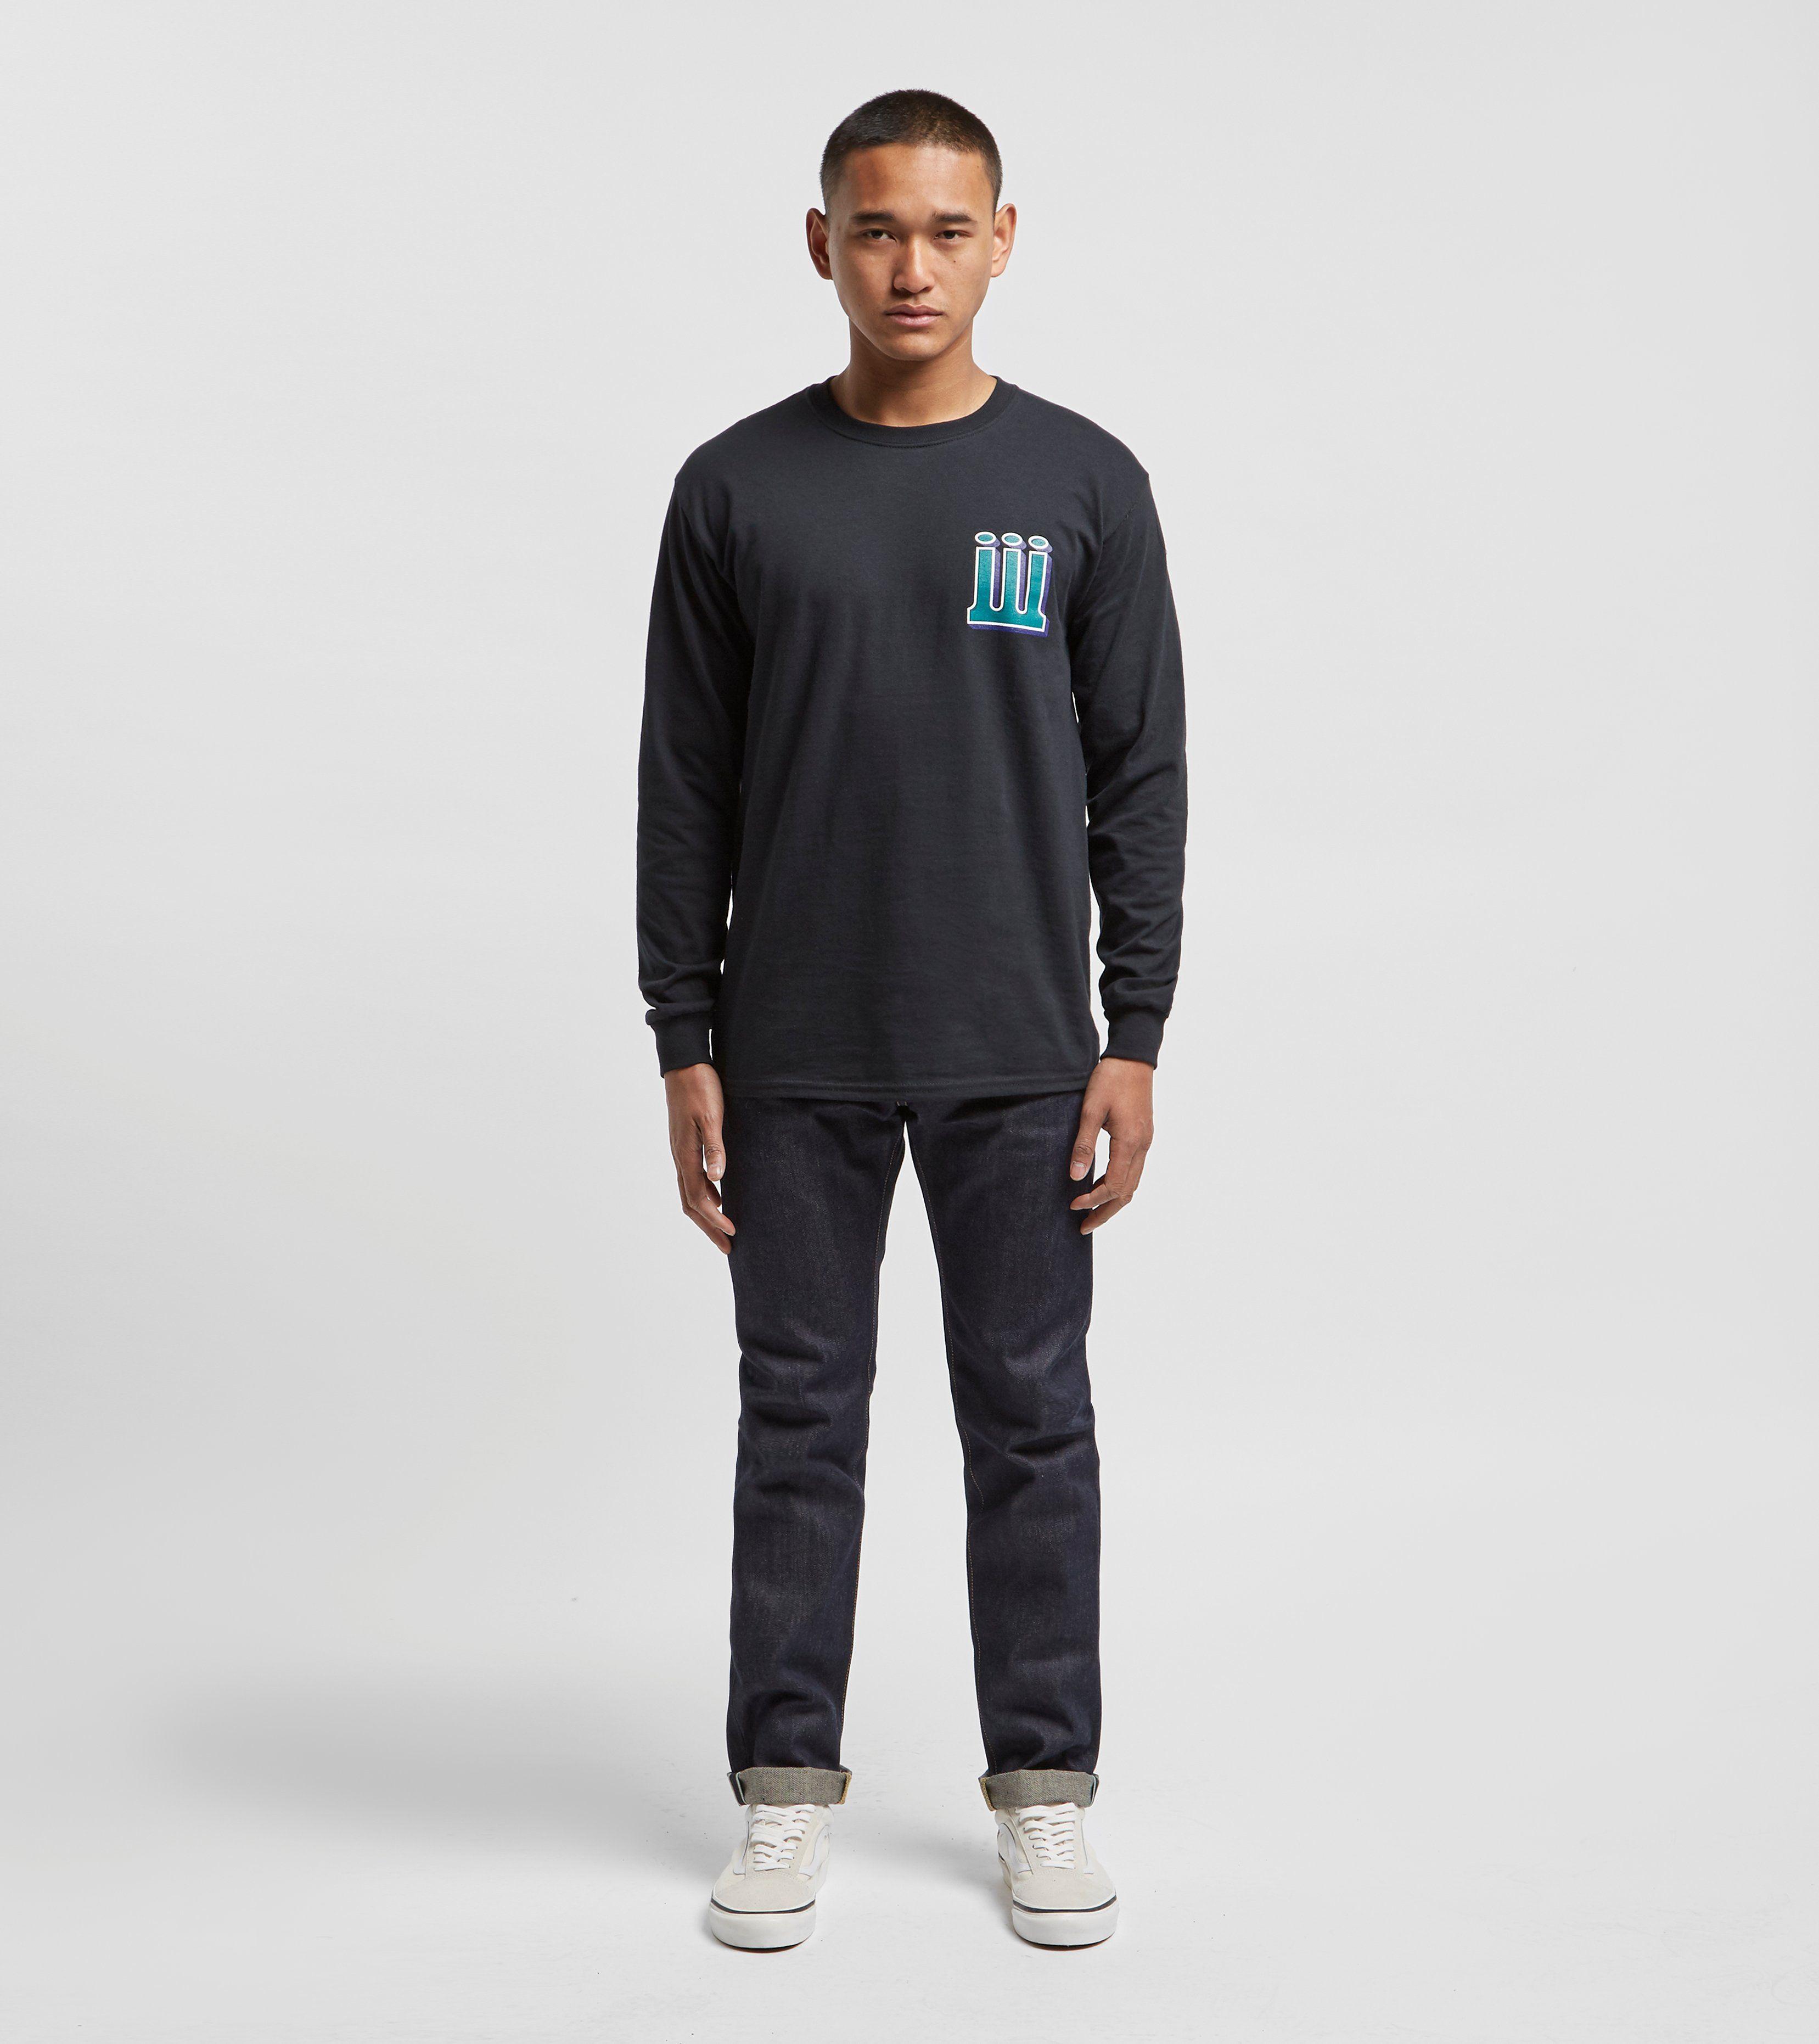 PIILGRIM Structure Long Sleeve T-Shirt